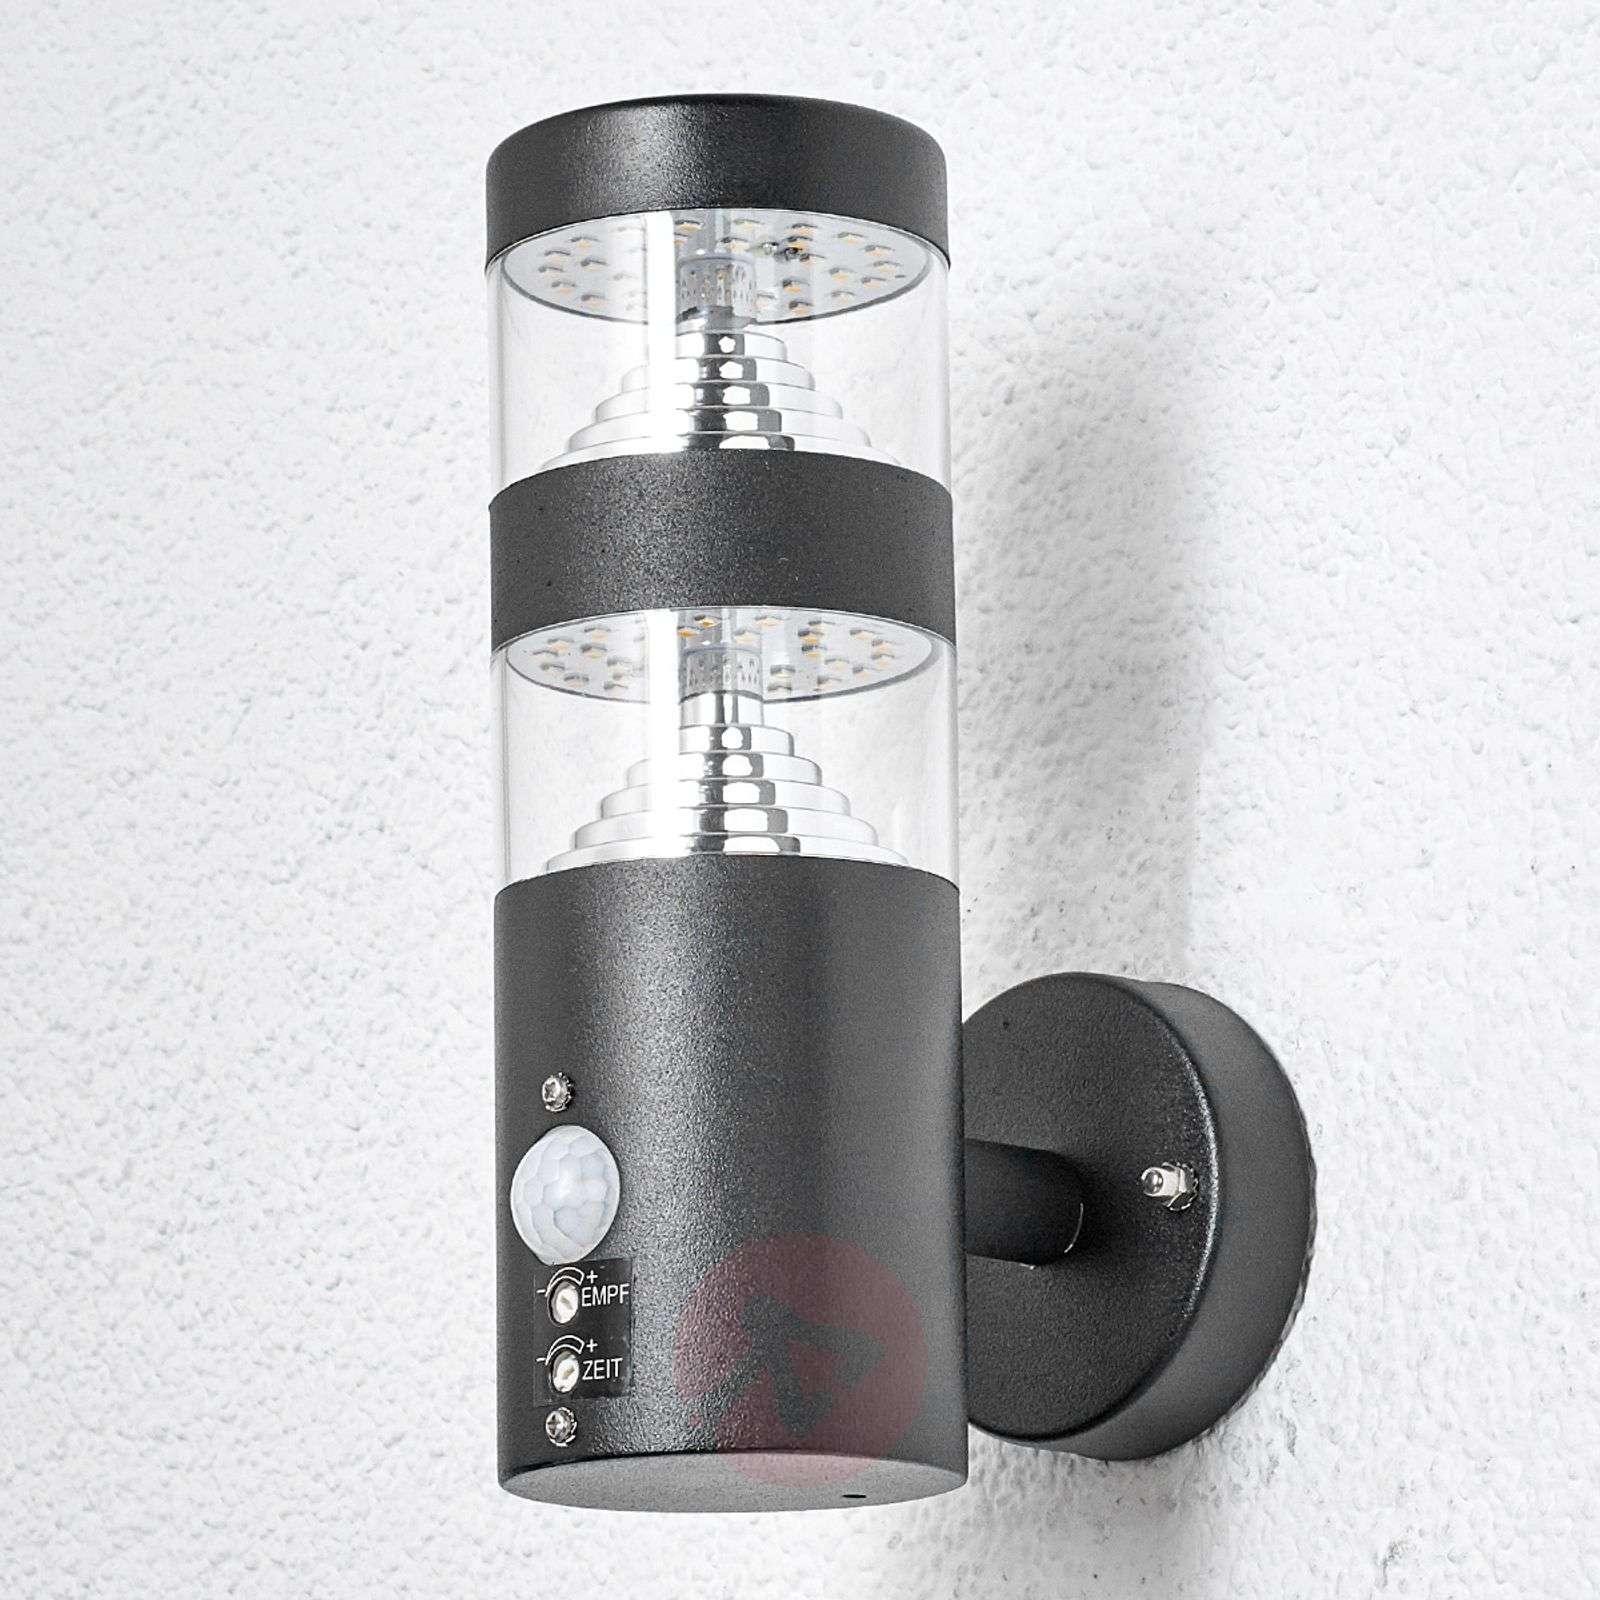 Lanea sensor outdoor wall light with LED-9988046-01